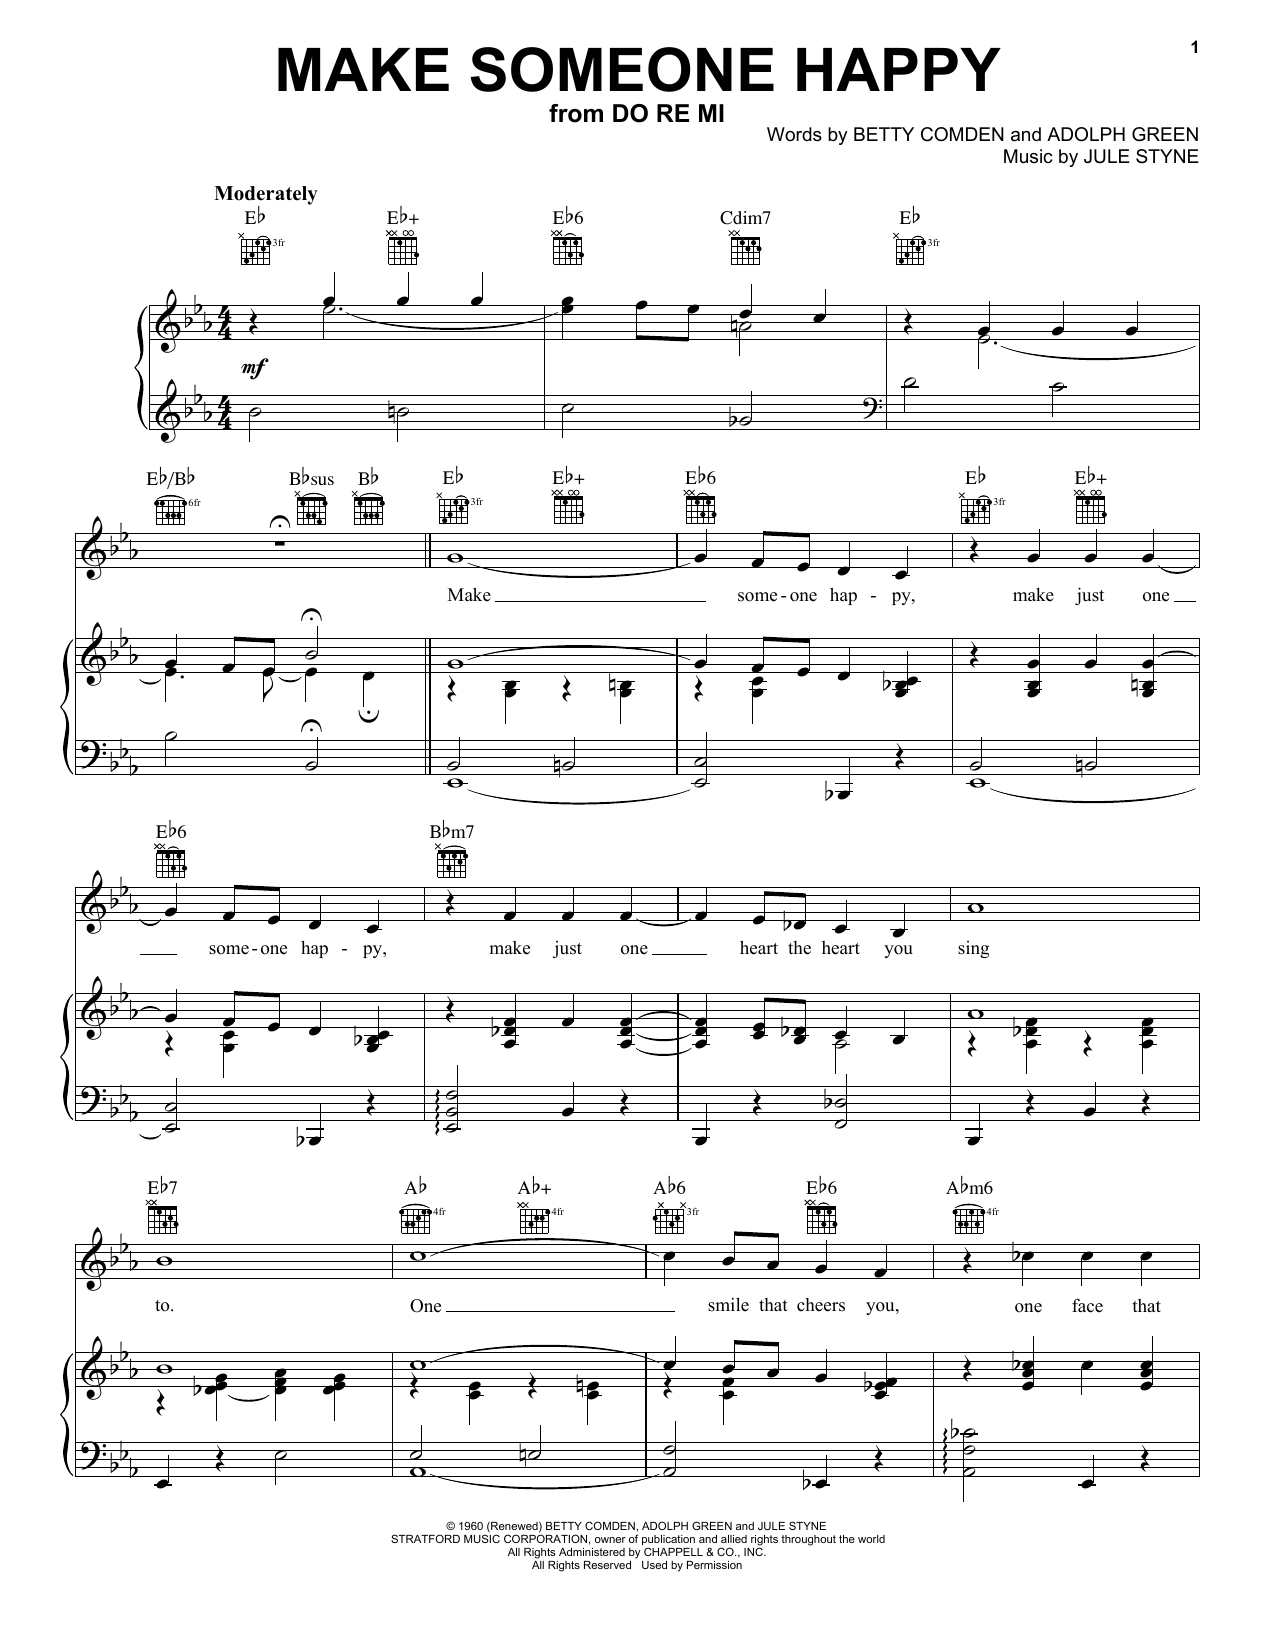 jimmy duarante make someone happy sheet music pdf notes chords jazz score piano vocal guitar right hand melody download printable sku 52338 jimmy duarante make someone happy sheet music notes chords download printable piano vocal guitar right hand melody sku 52338